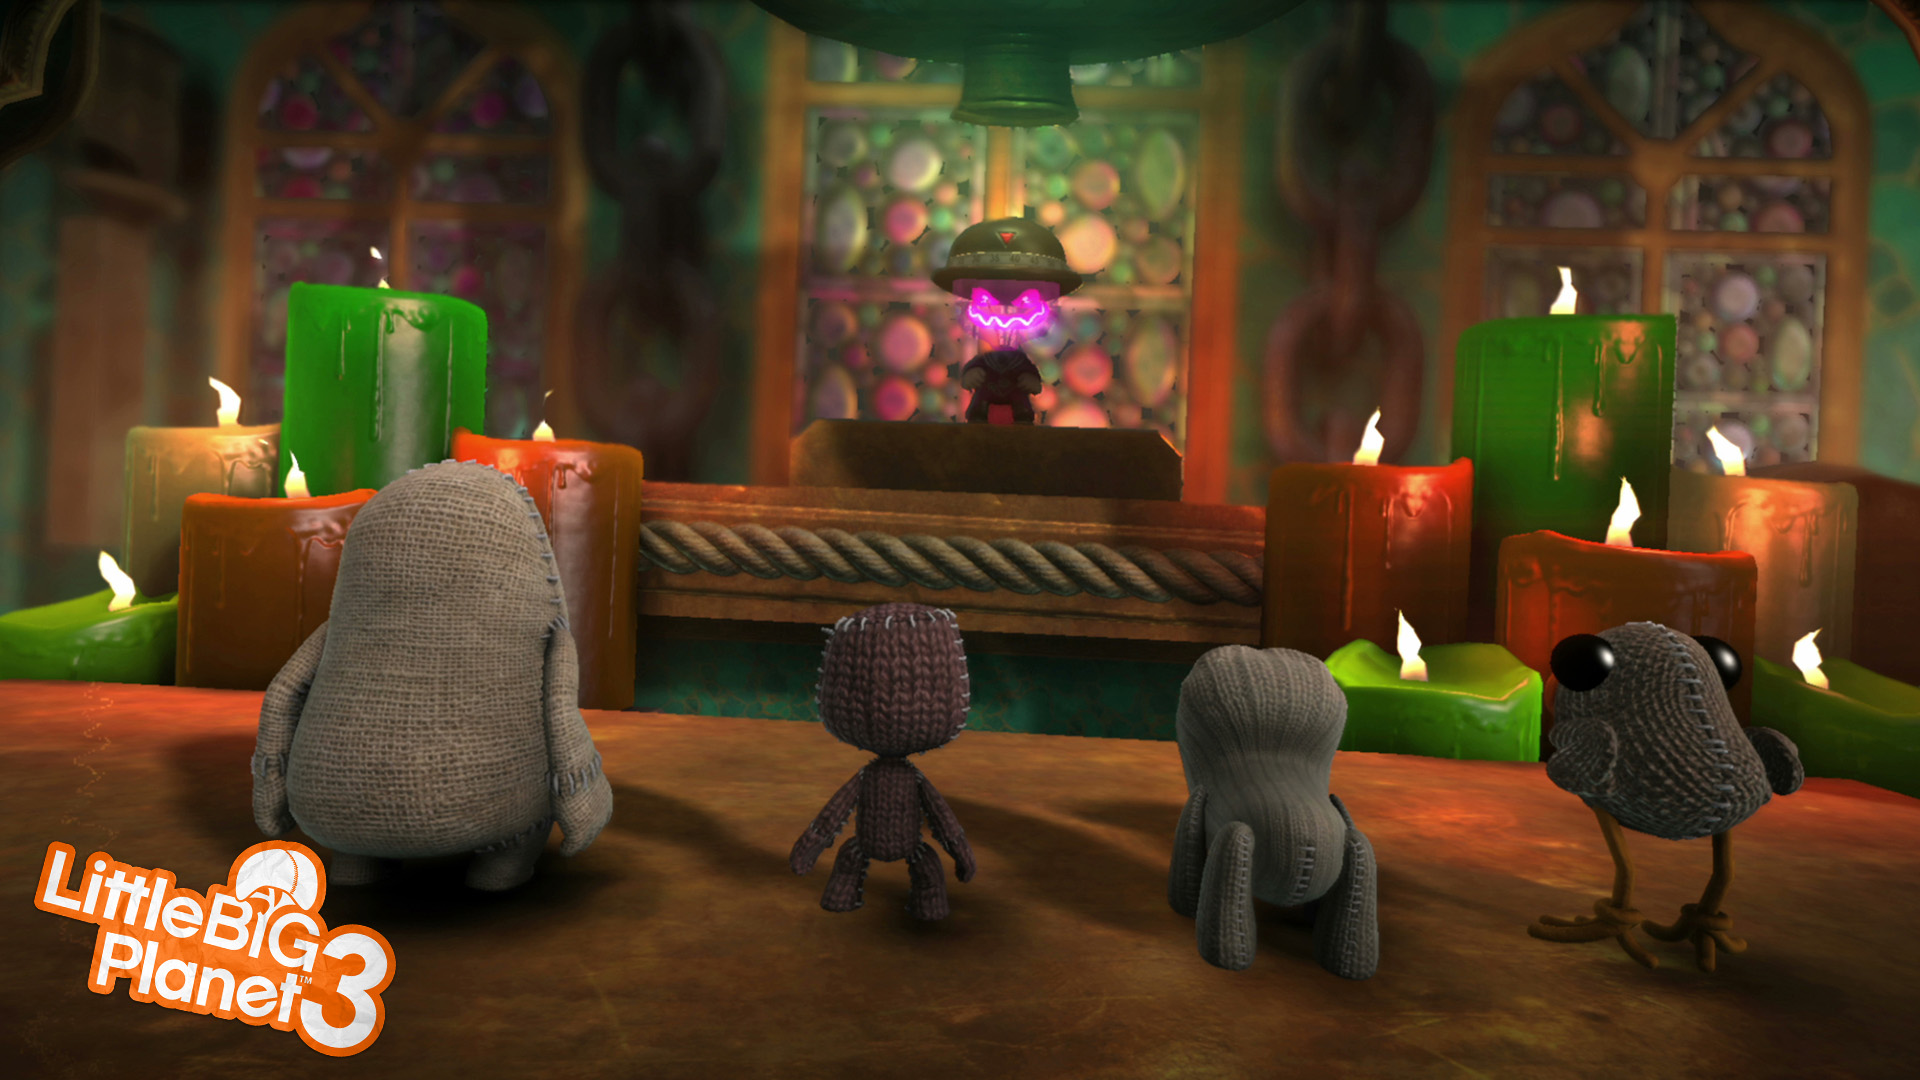 LittleBigPlanet3 PS4 Editeur 021